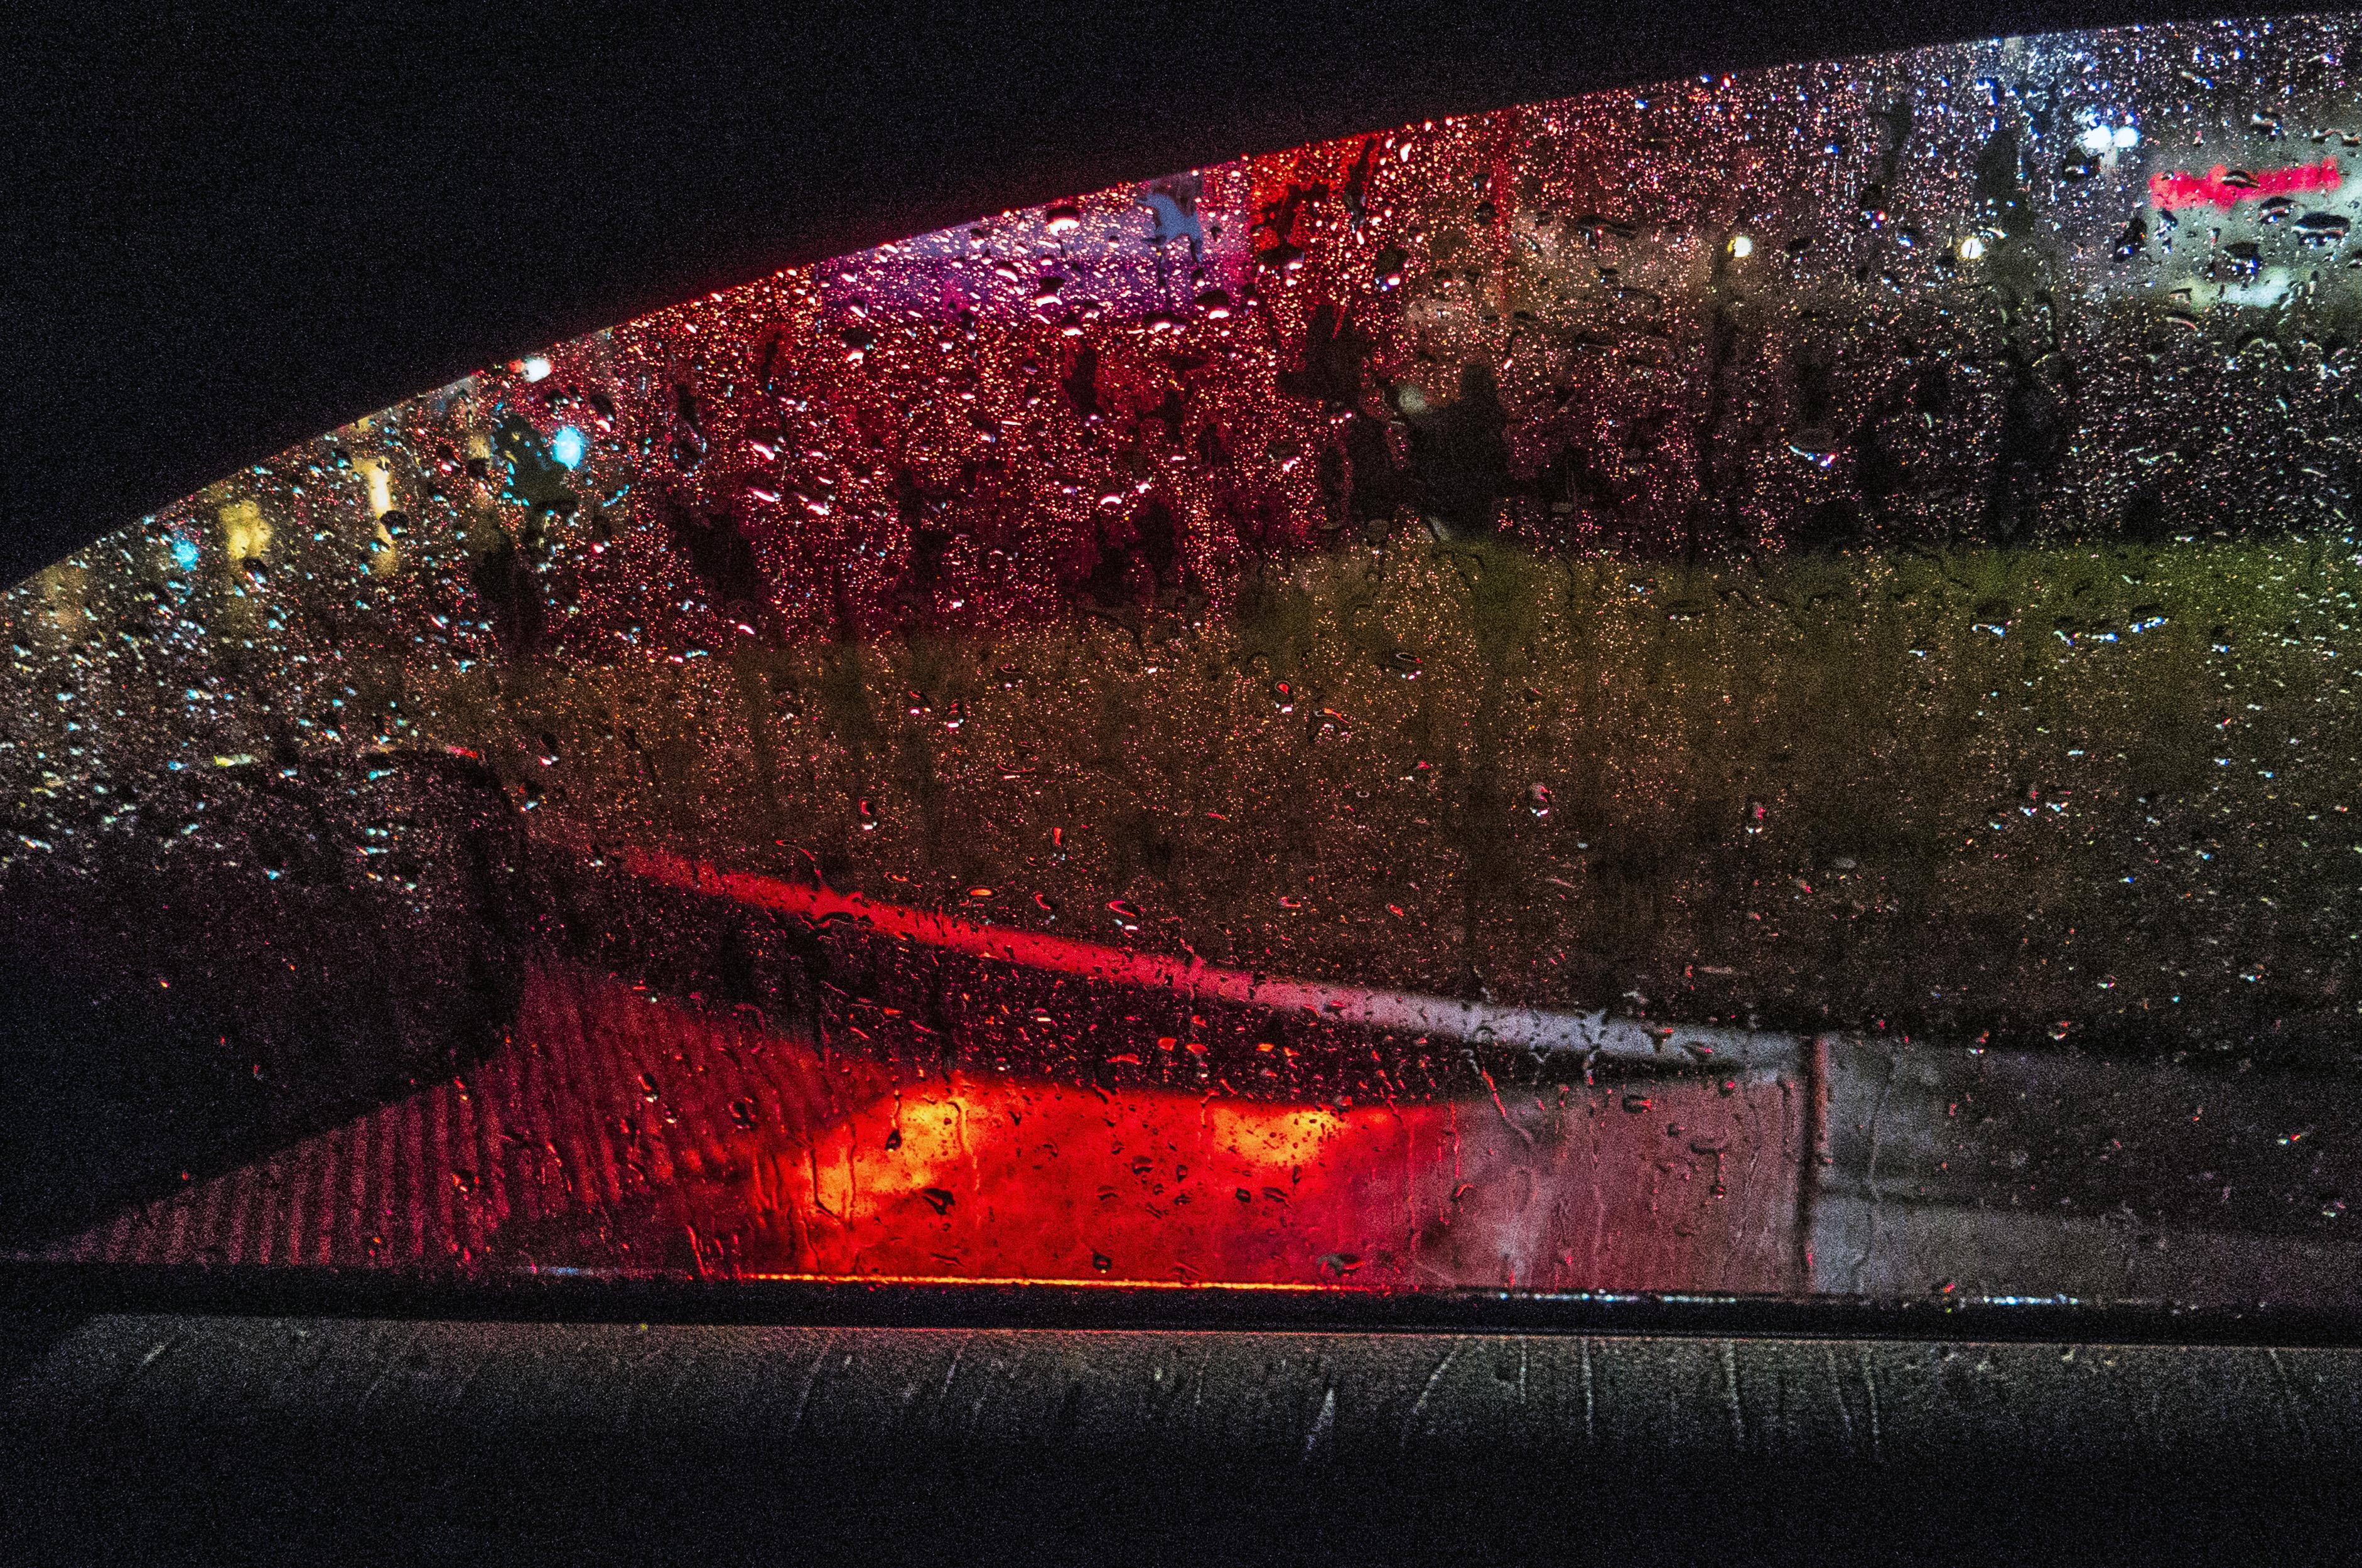 Free Images Light Night Rain Window Glass